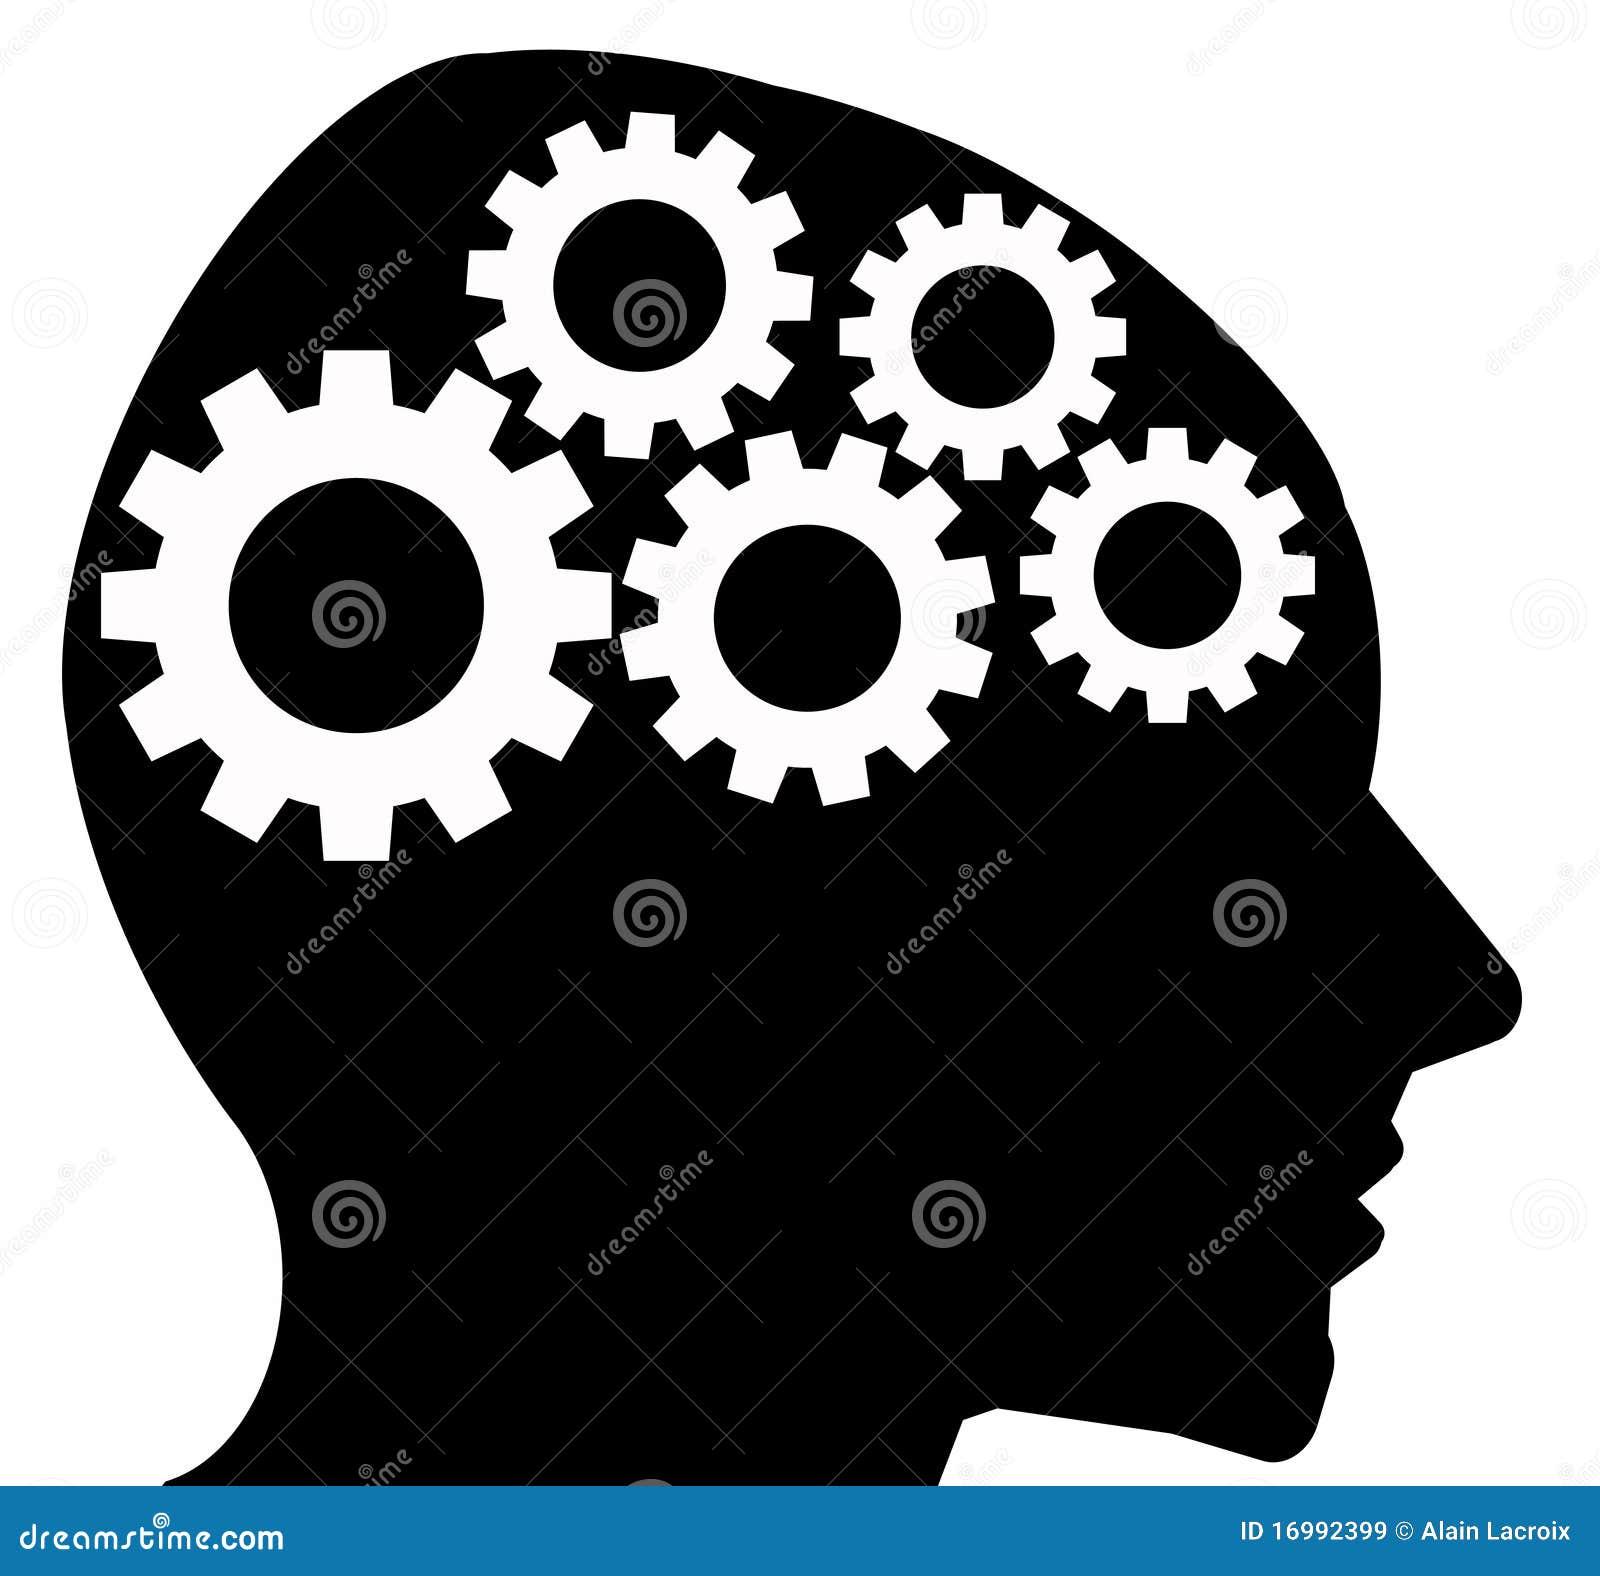 Thinking Brain Royalty Free Stock Images - Image: 16992399